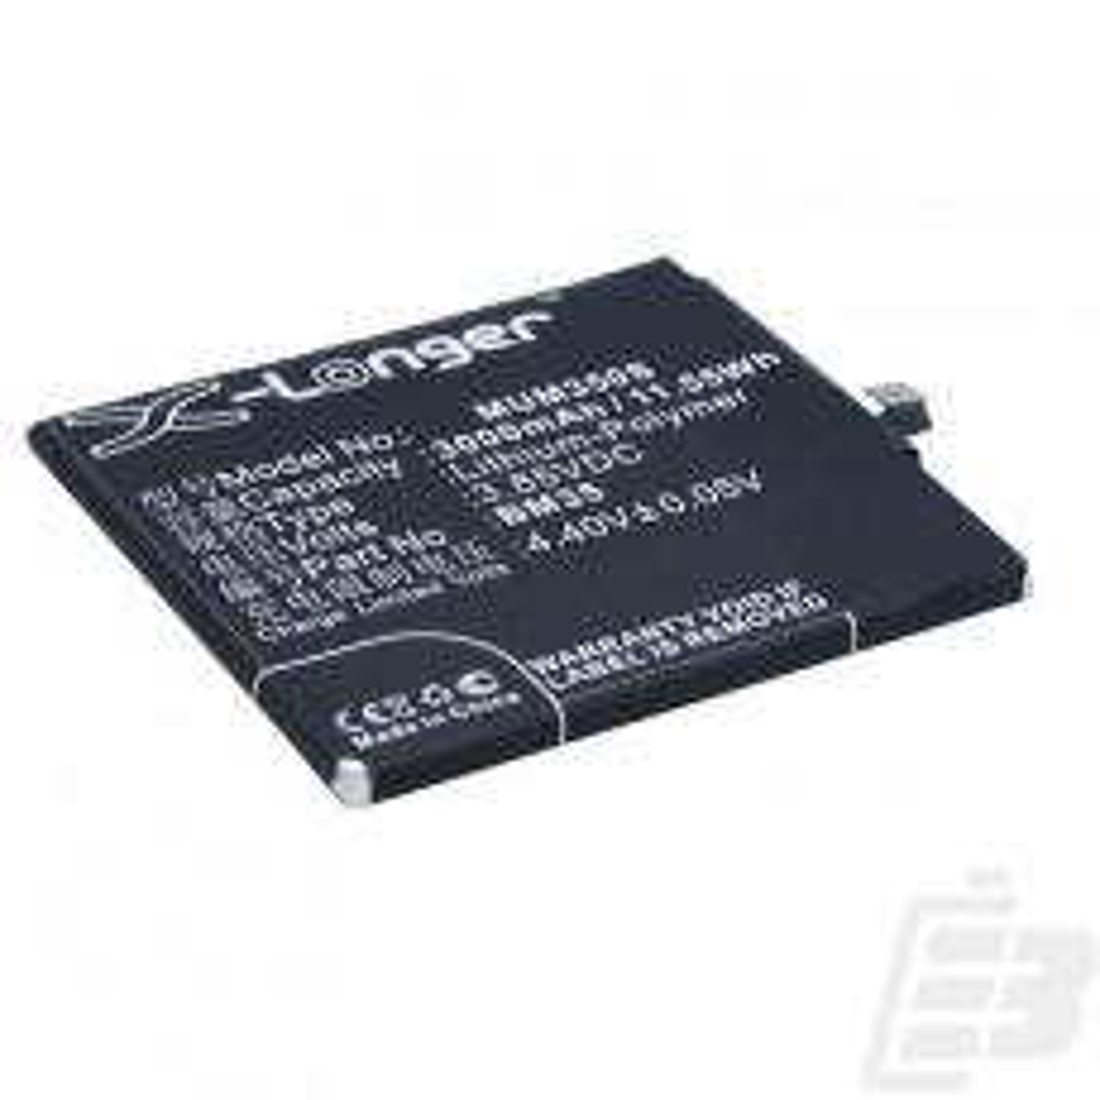 Smartphone battery Xiaomi Mi 4c_1